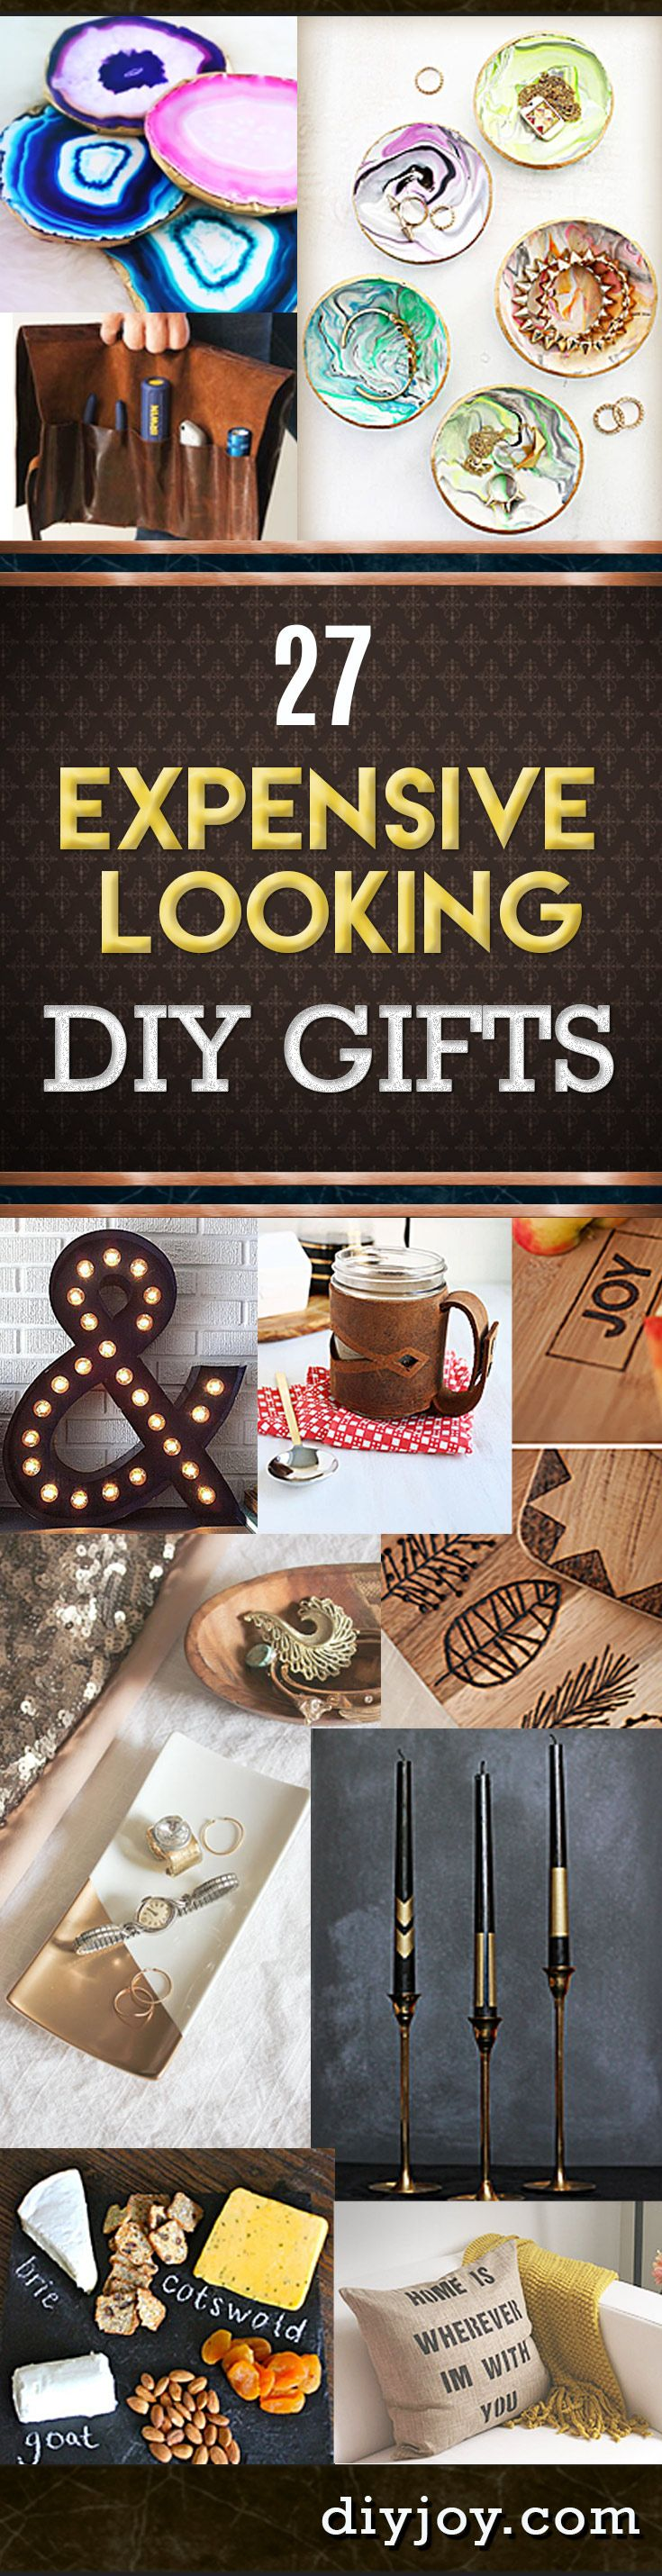 Inexpensive DIY Gifts To Make For Christmas & BirthdaysBarbara Brum